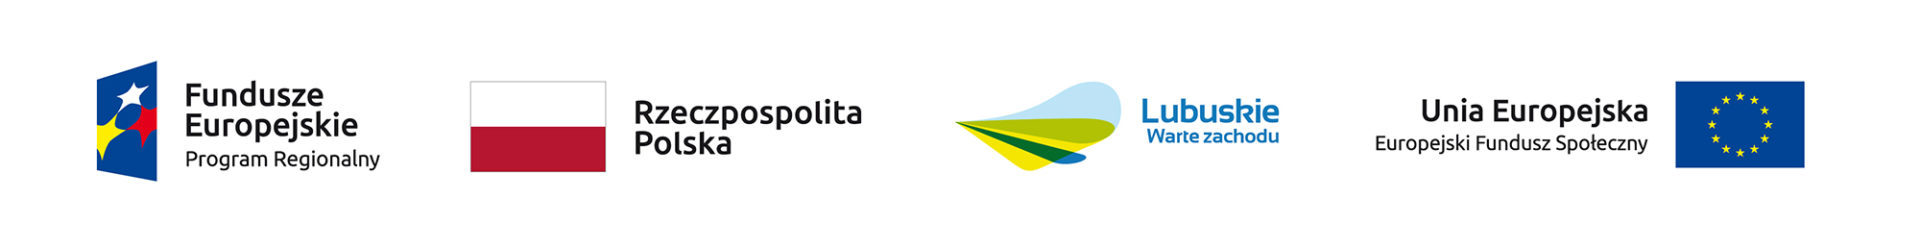 Plansza logo unijne